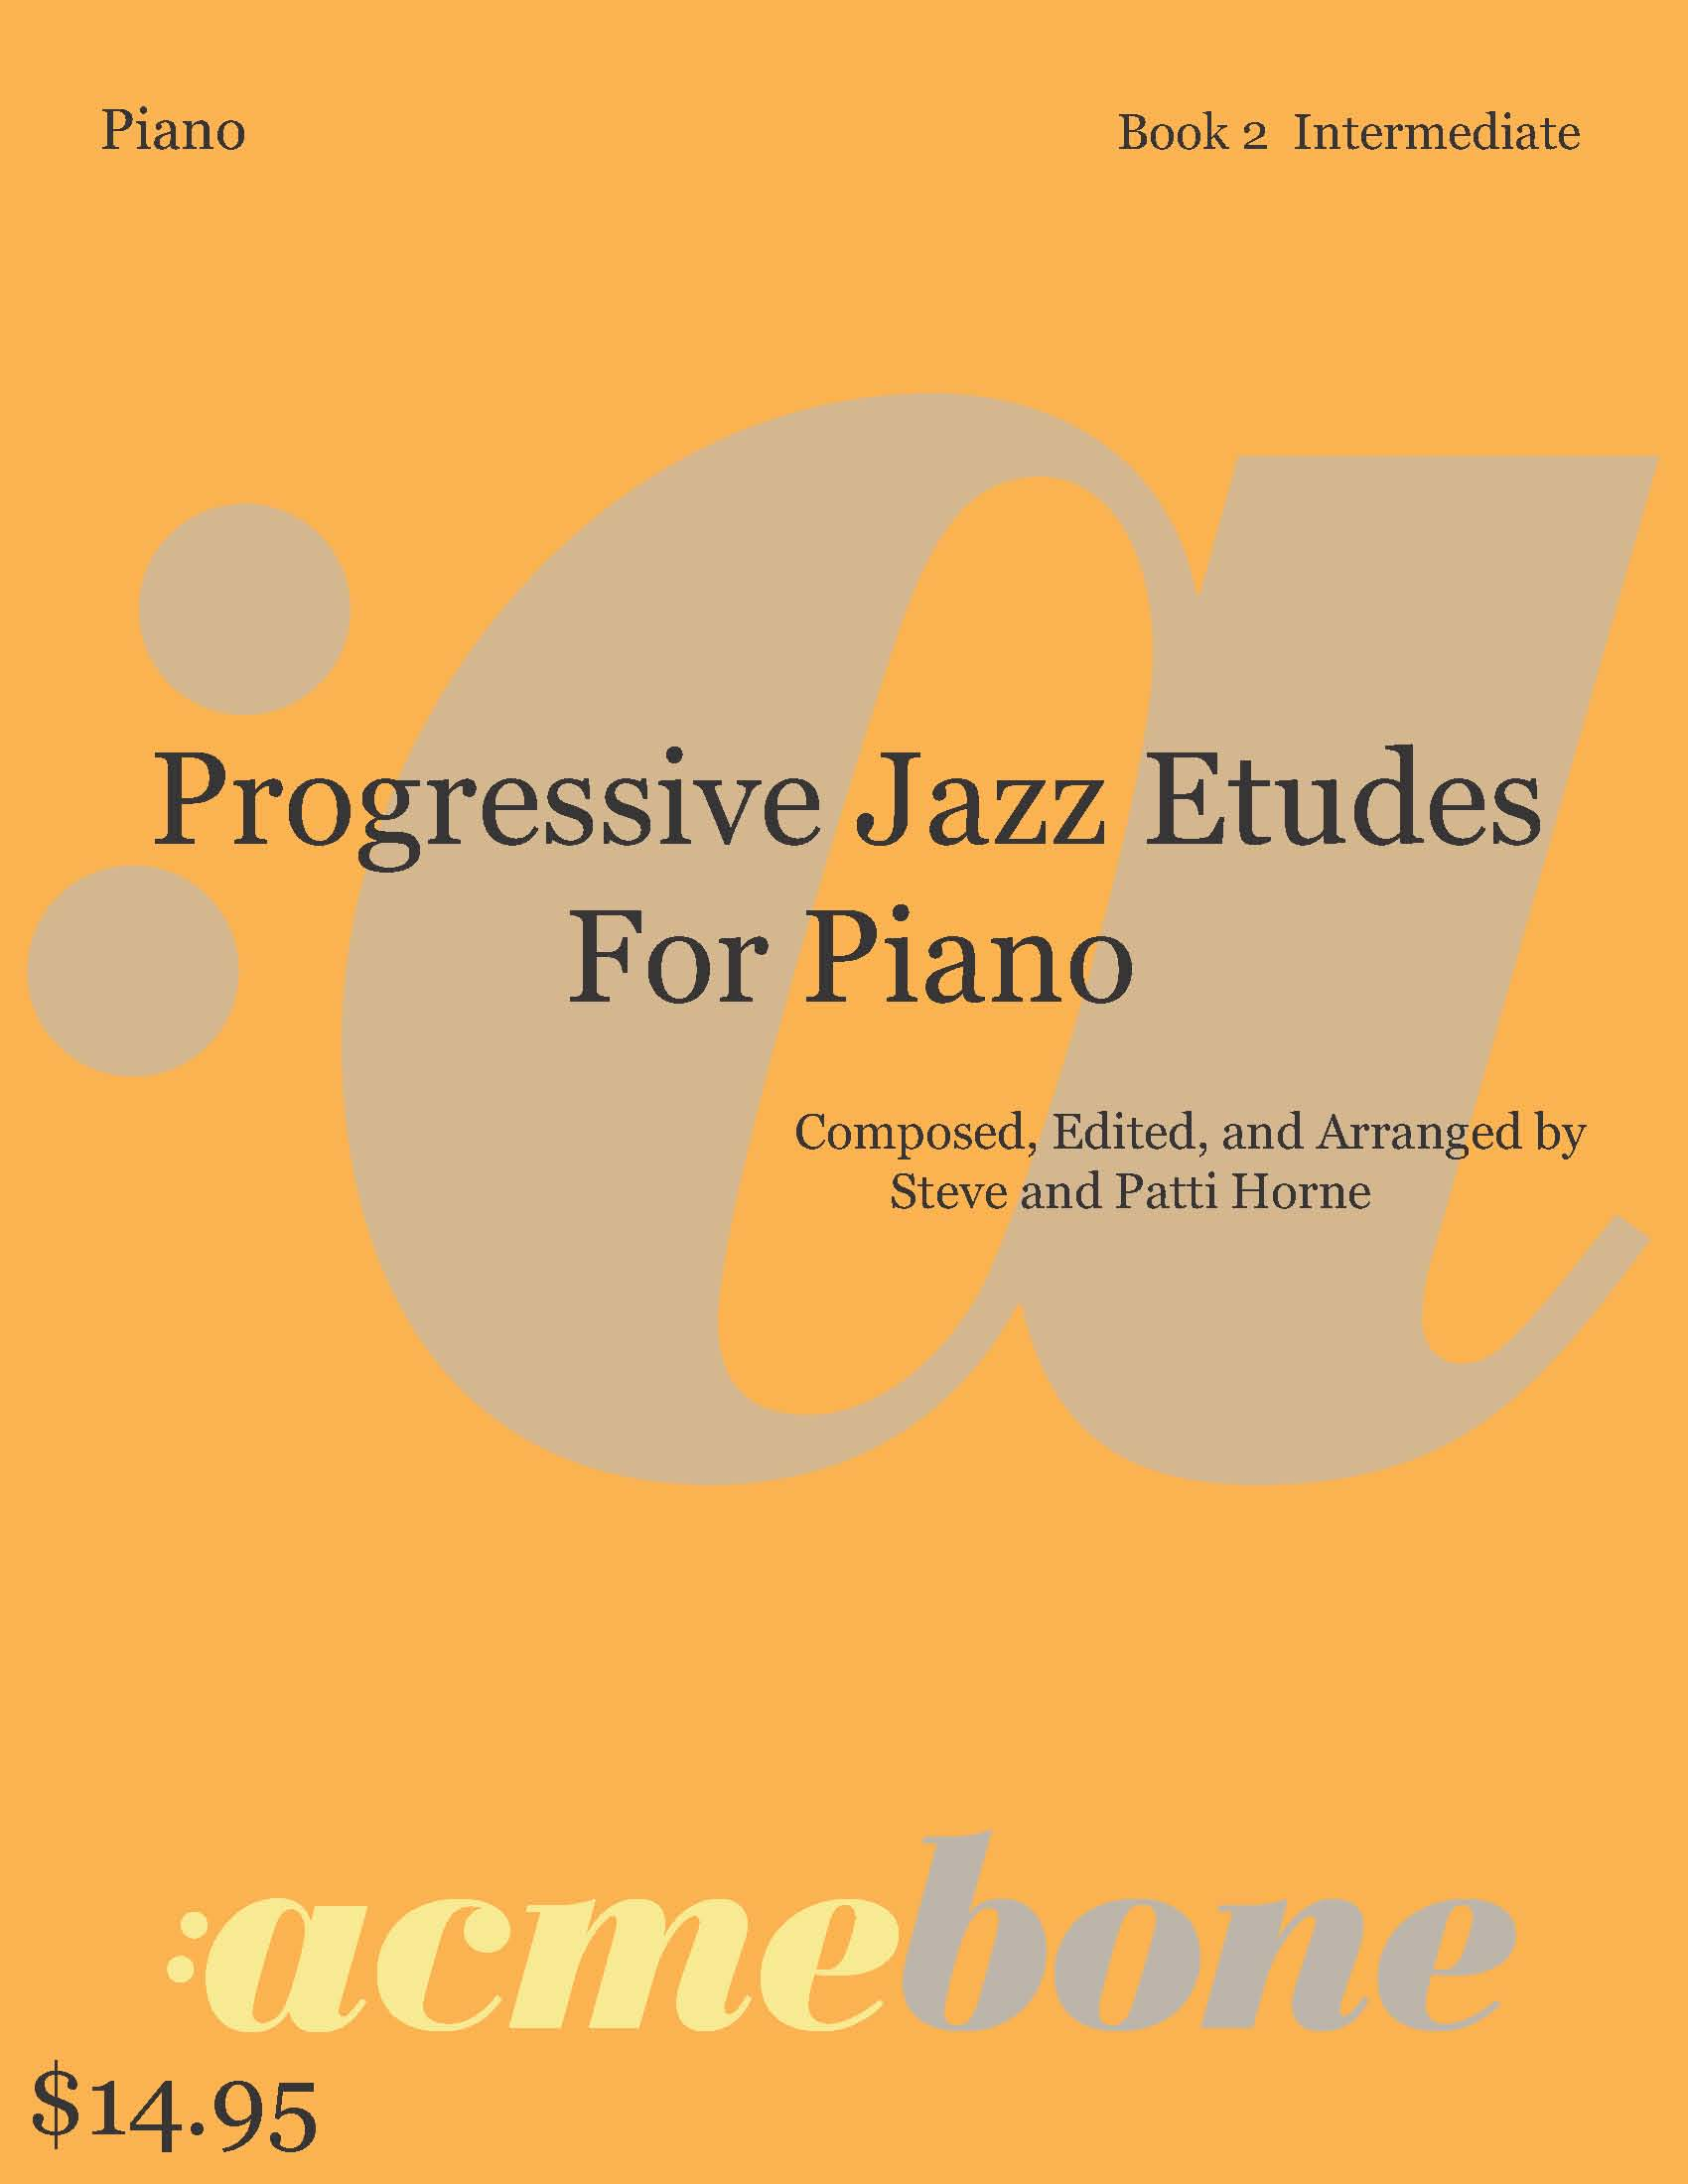 Piano Etudes_cover_book2_price.jpg